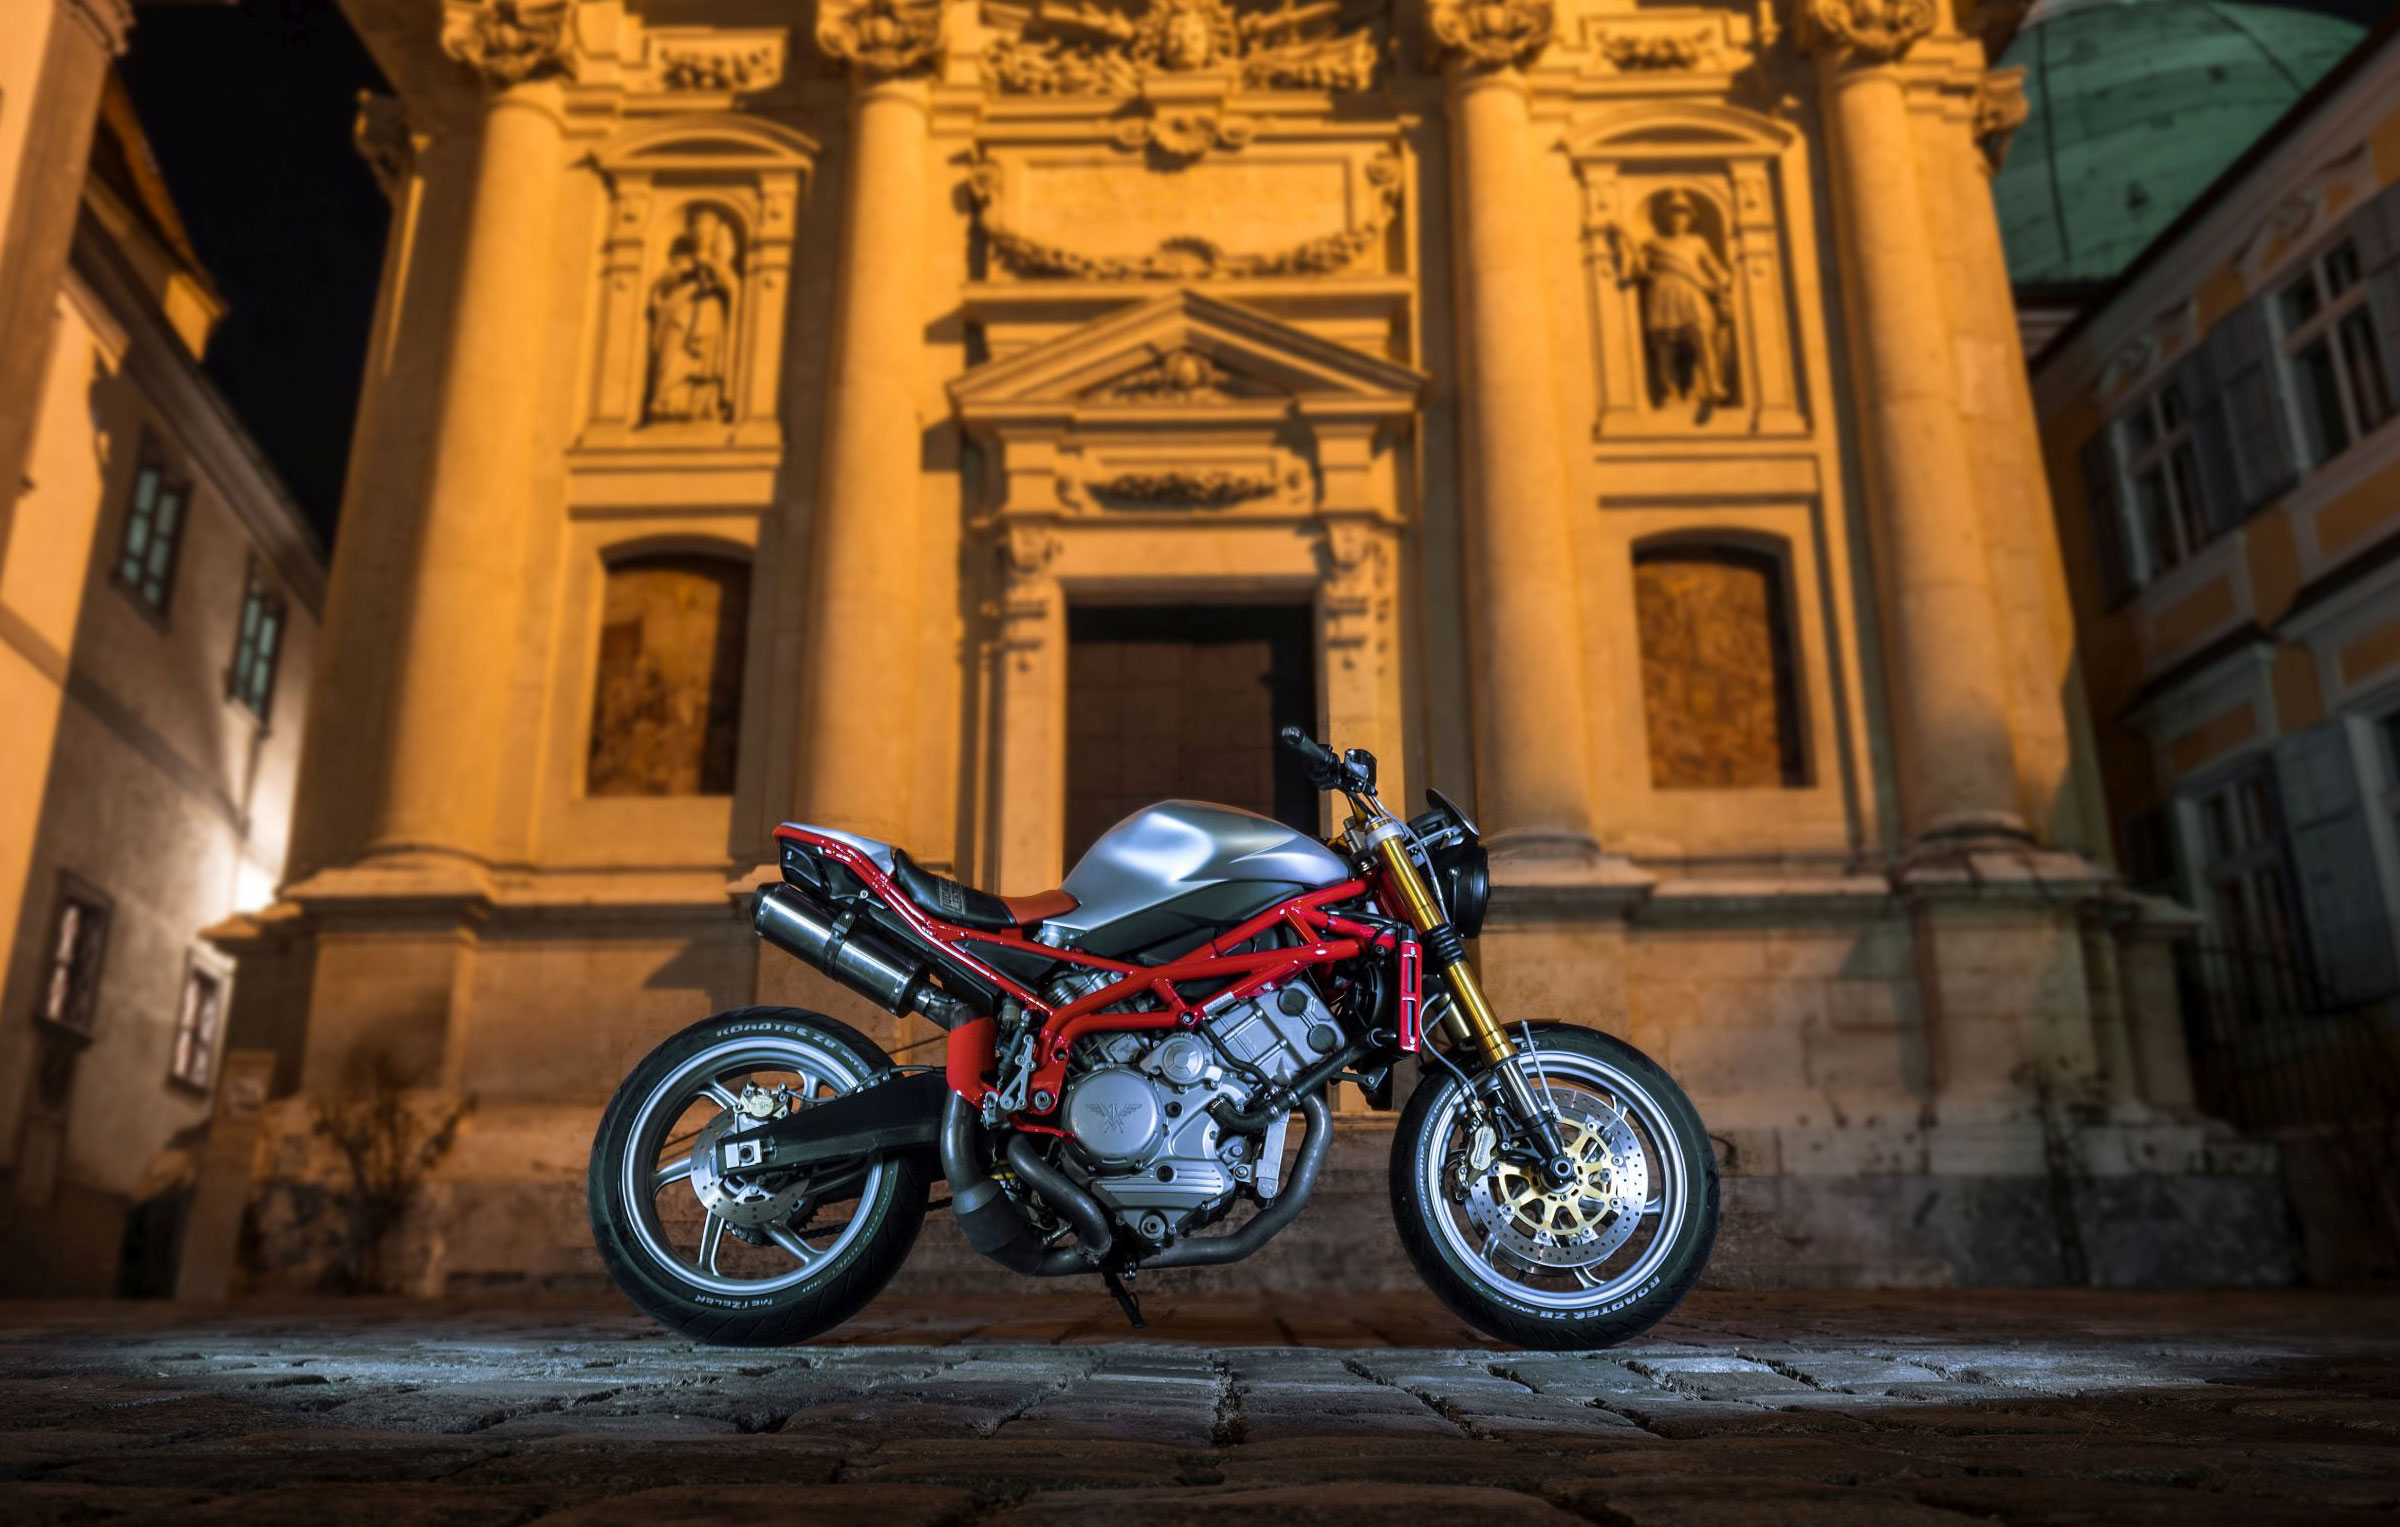 Blog-Moto--Morini--Corsaro-Umbau-Graz-Titan-Motorcycle-Company-Austria-Superleggera-Italian-Diva-City-Park-Schlossberg-Street-Legal-Typisiert